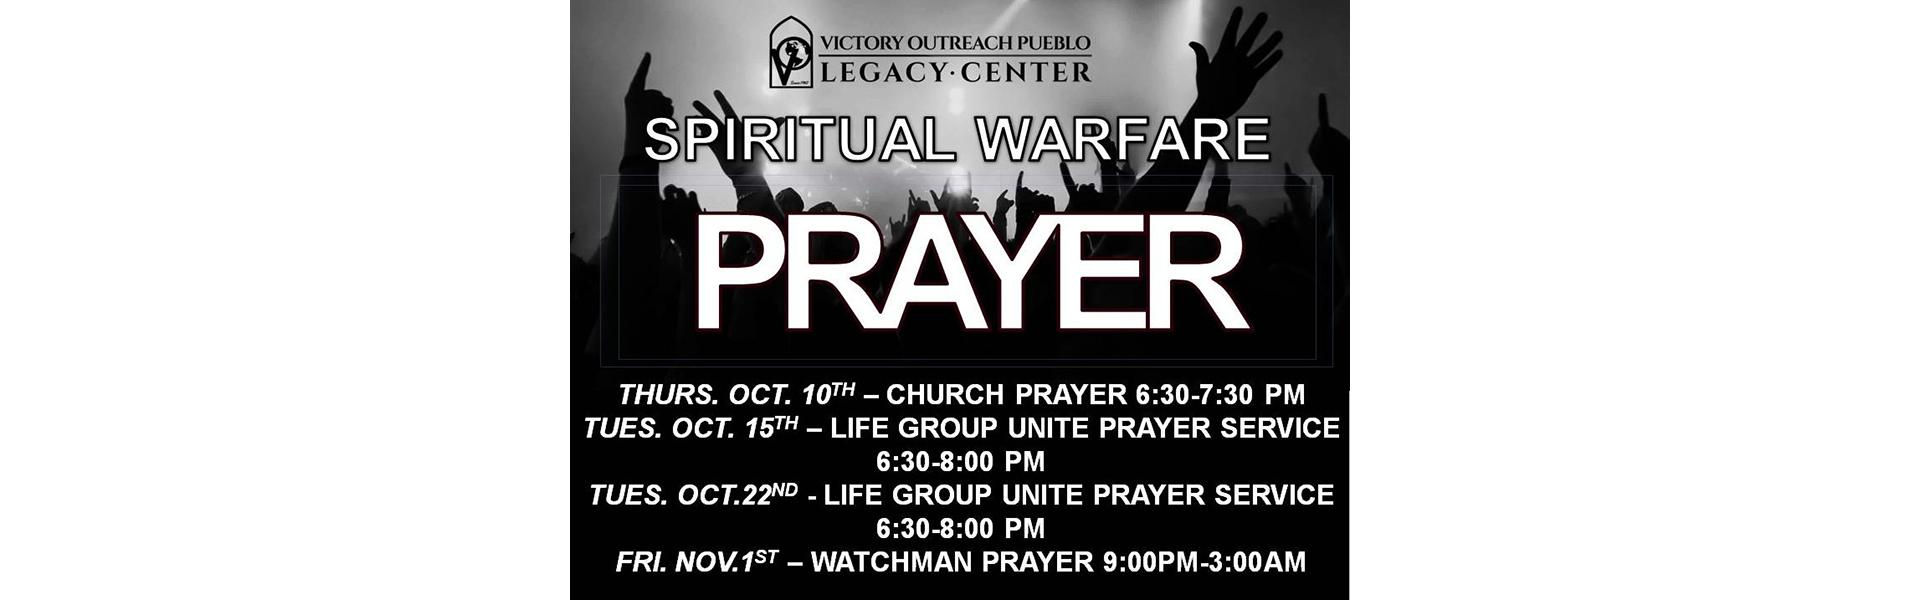 Spiritual Warfare Prayer October